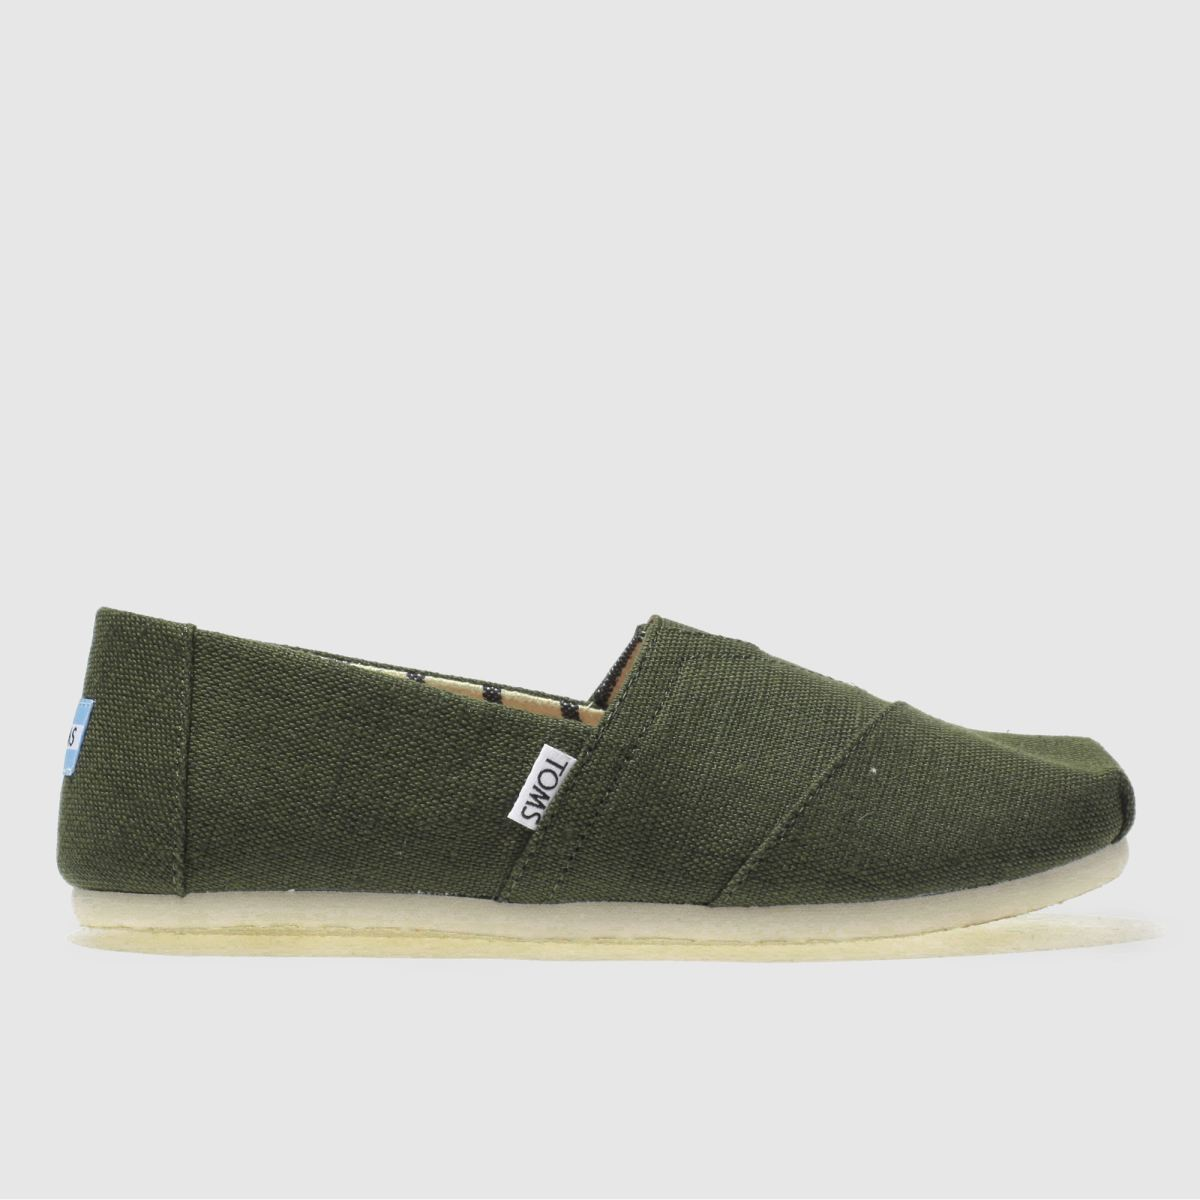 Toms Dark Green Alpargata Venice Shoes